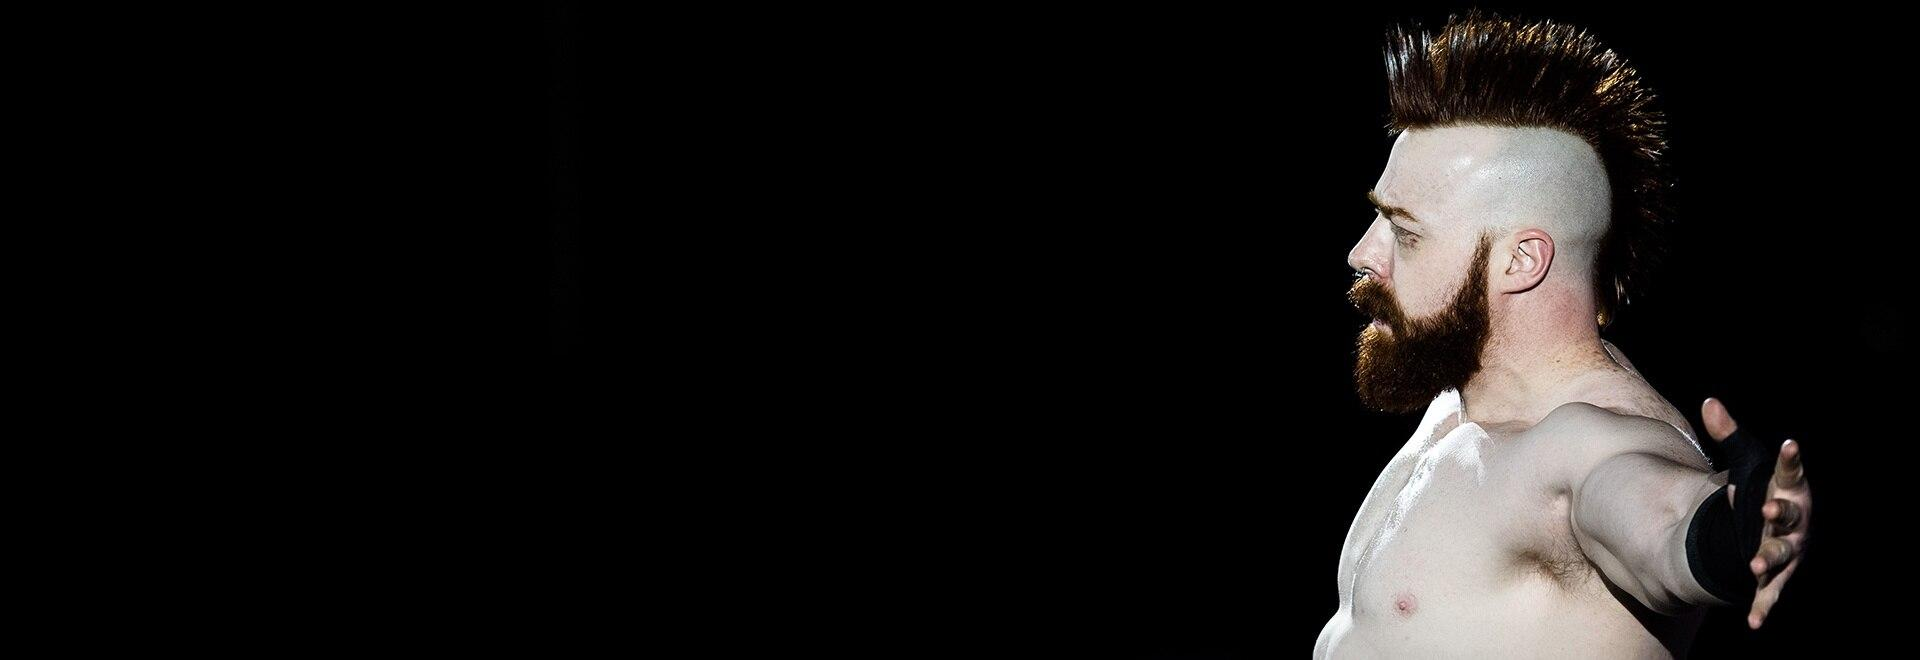 Ep. 36